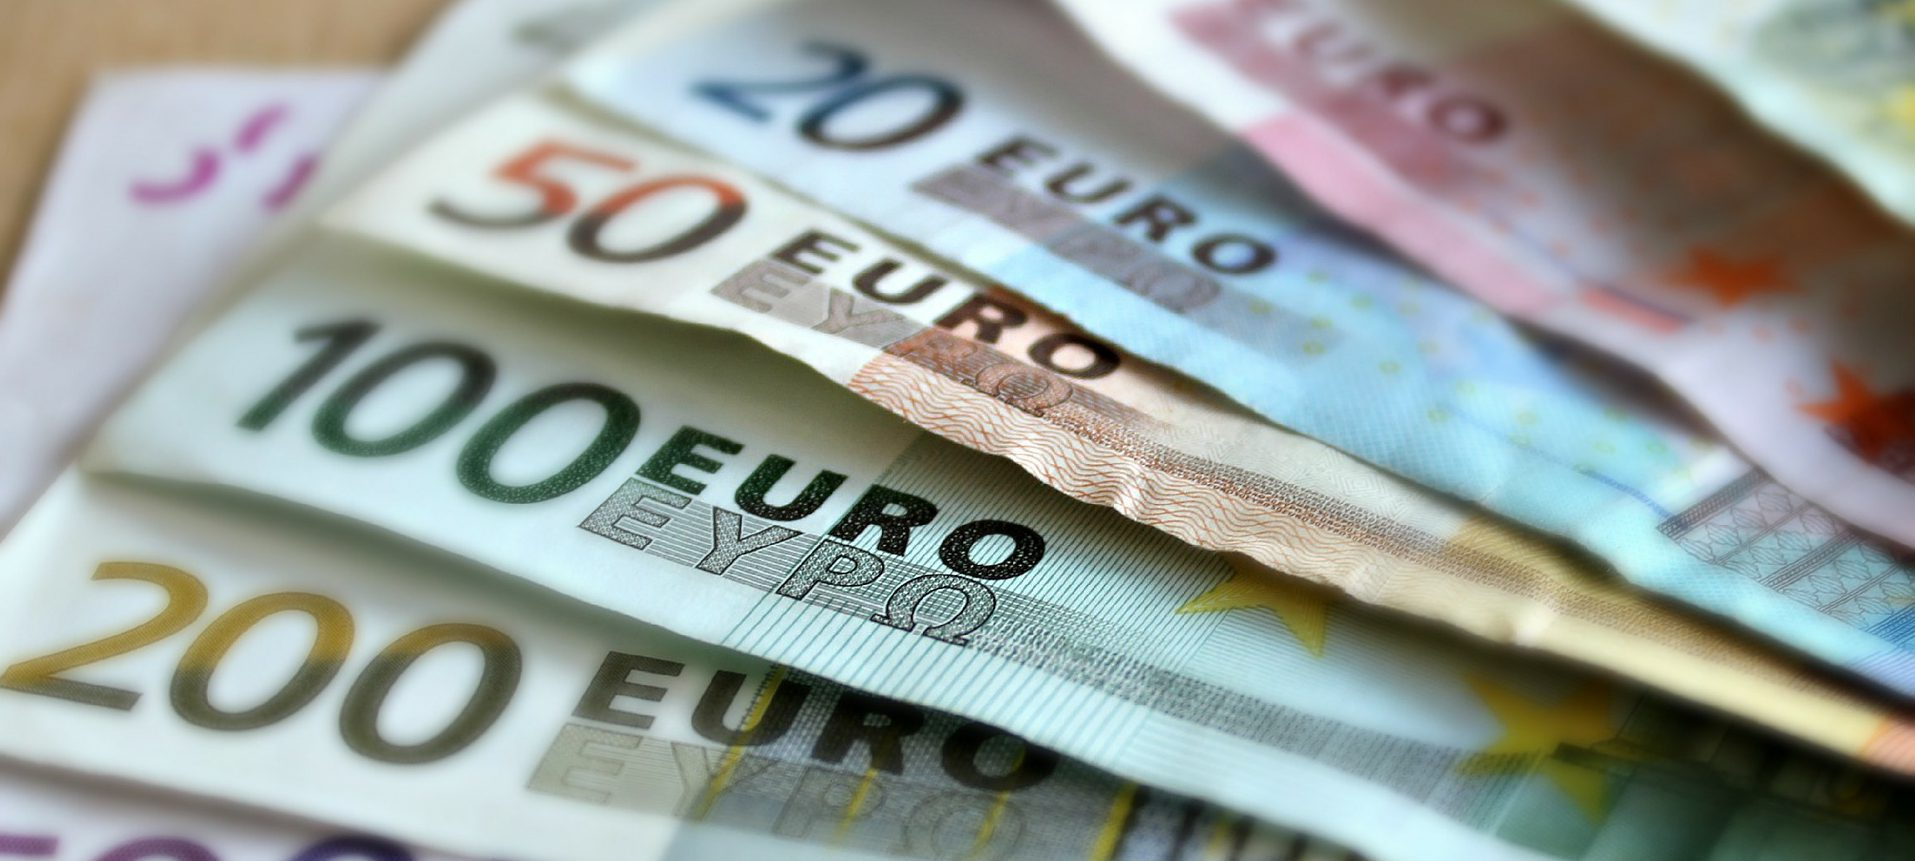 Währung - Kreuzfahrt